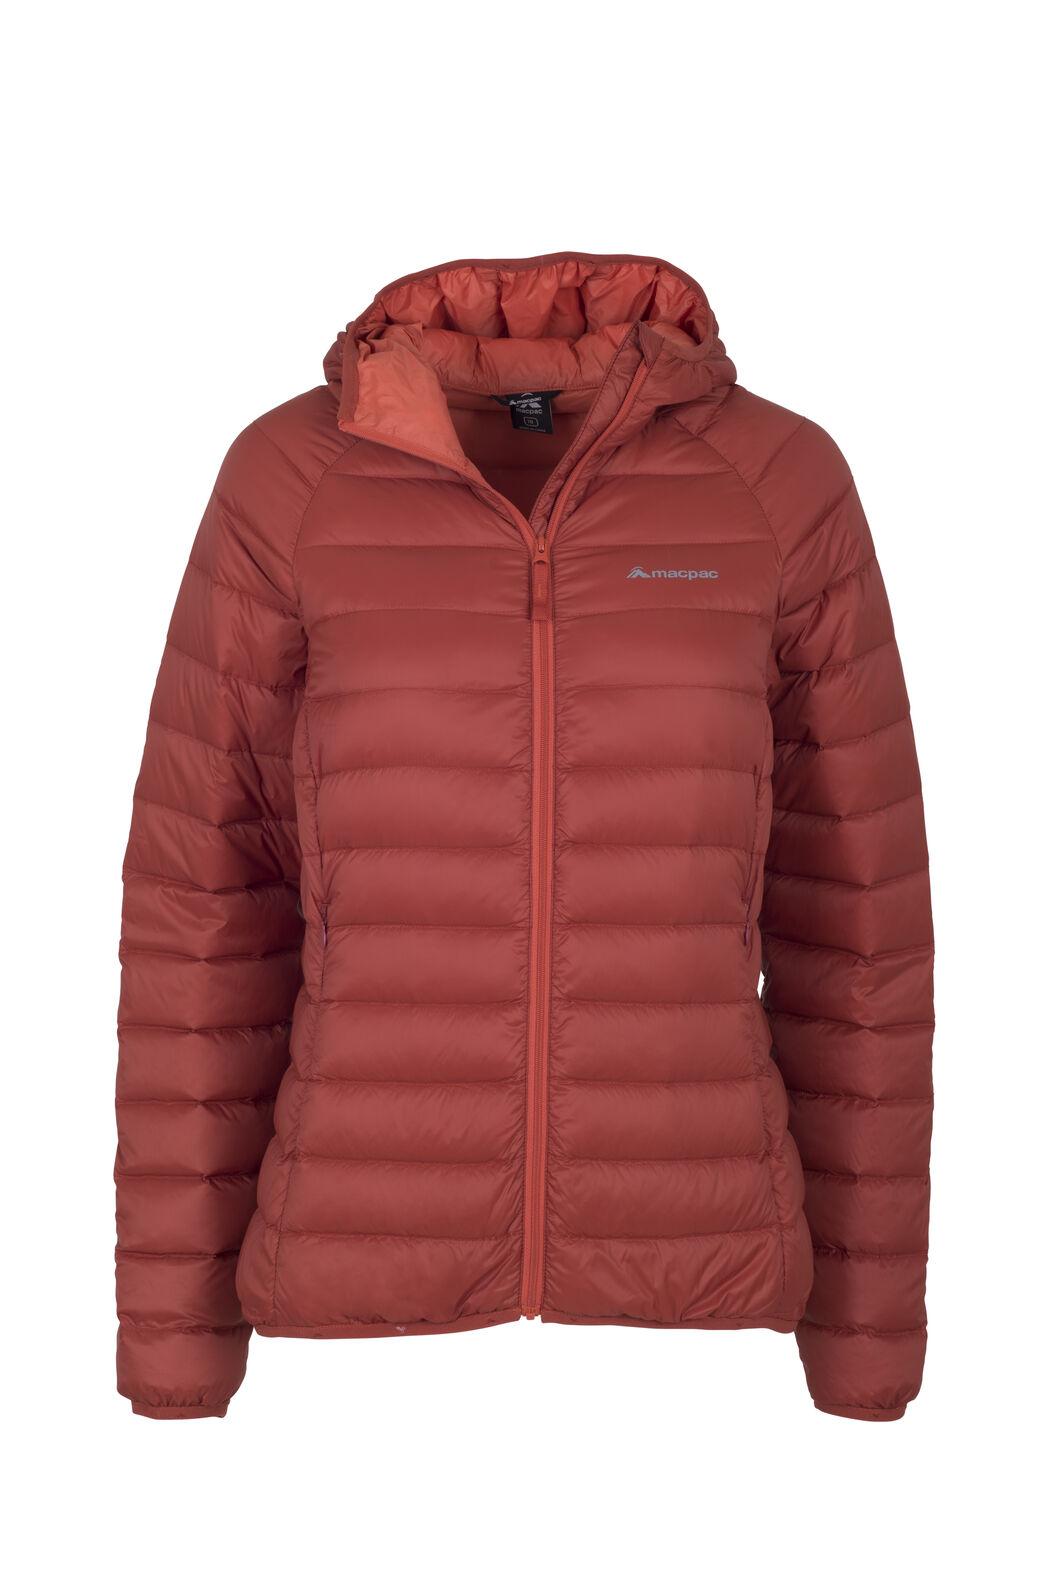 Macpac Uber Light Hooded Jacket - Women's, Red Ochre, hi-res